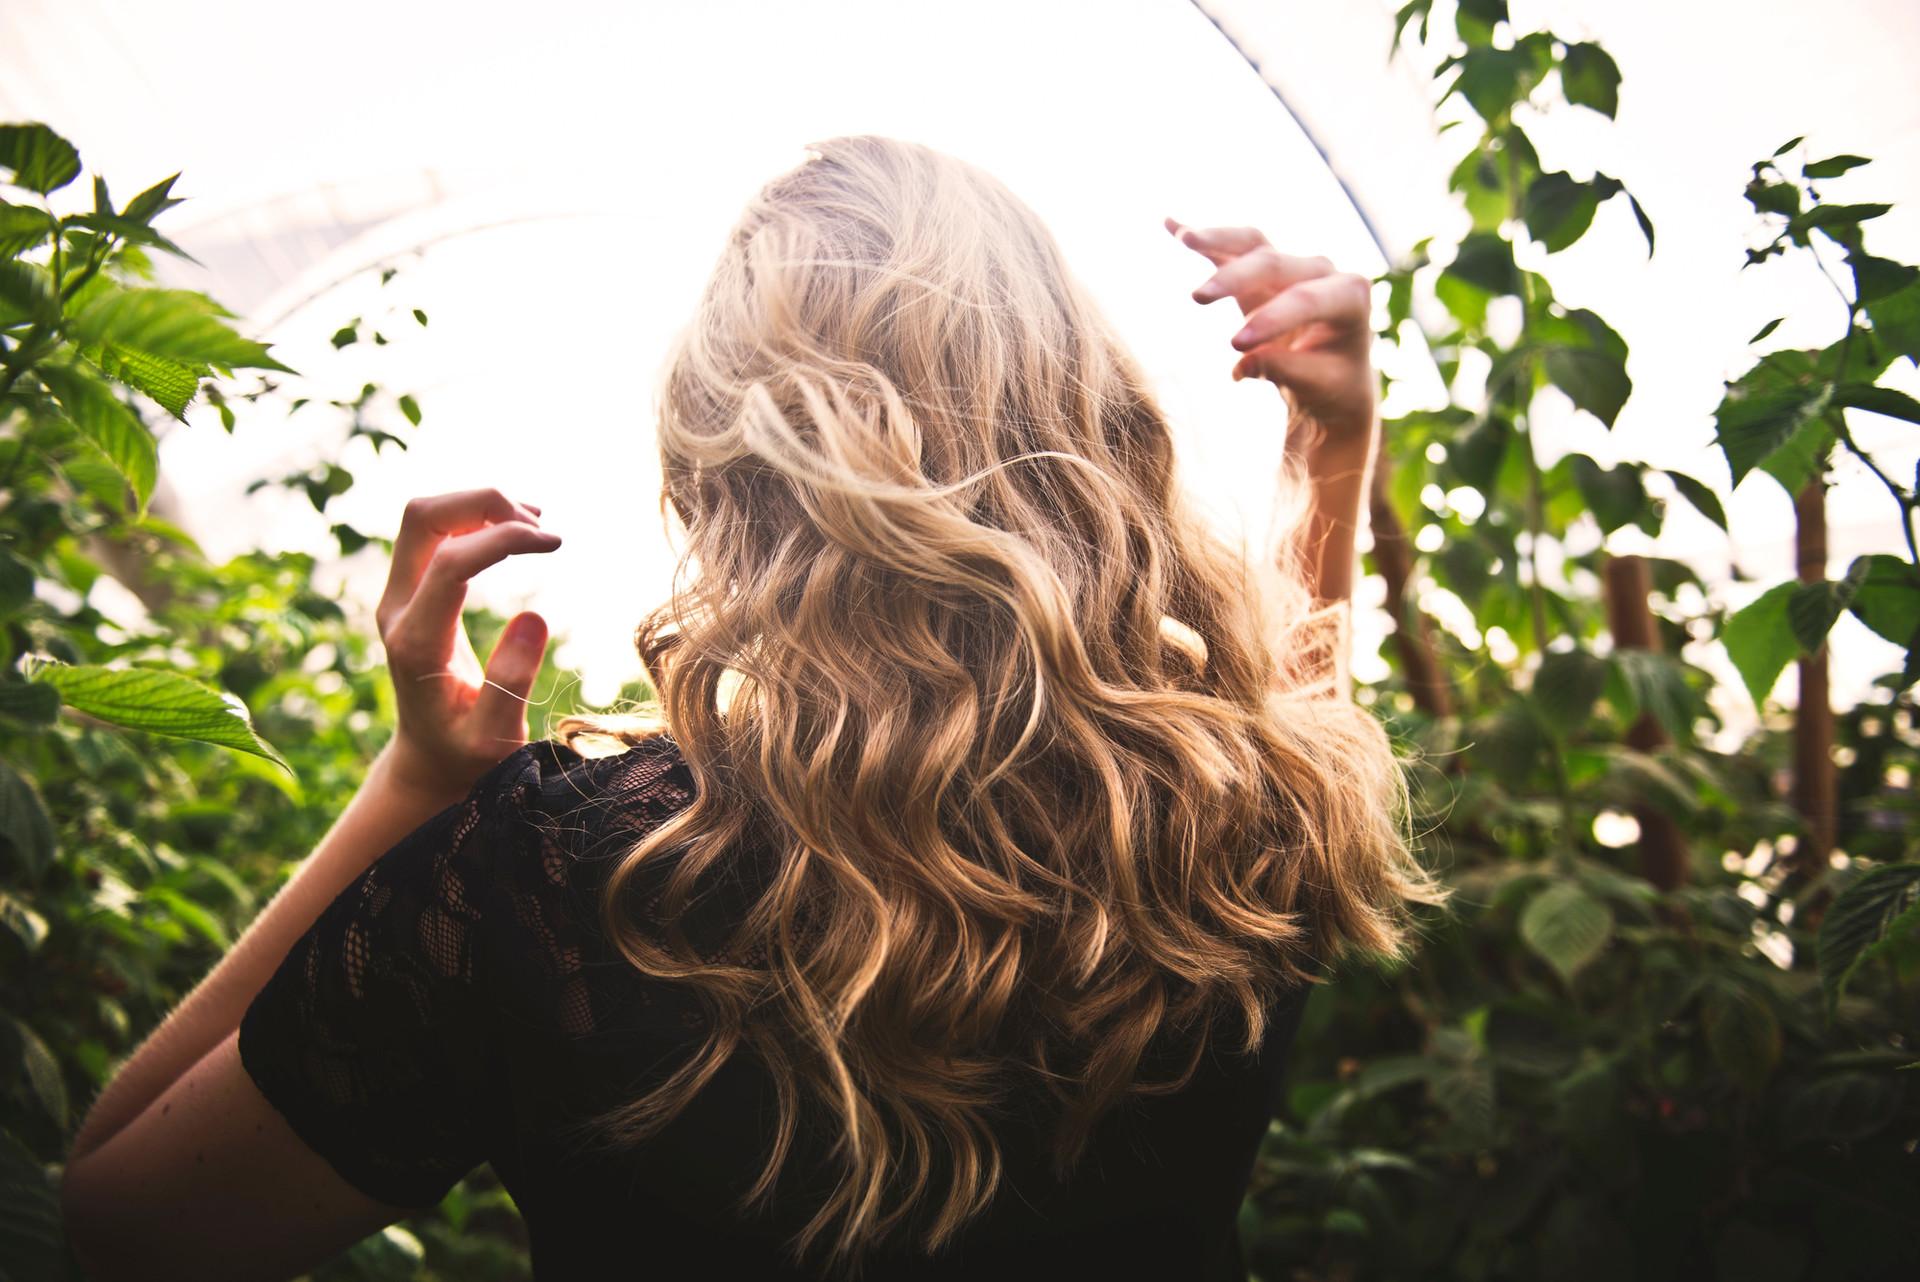 Hair Salon - Image by Tim Mossholder